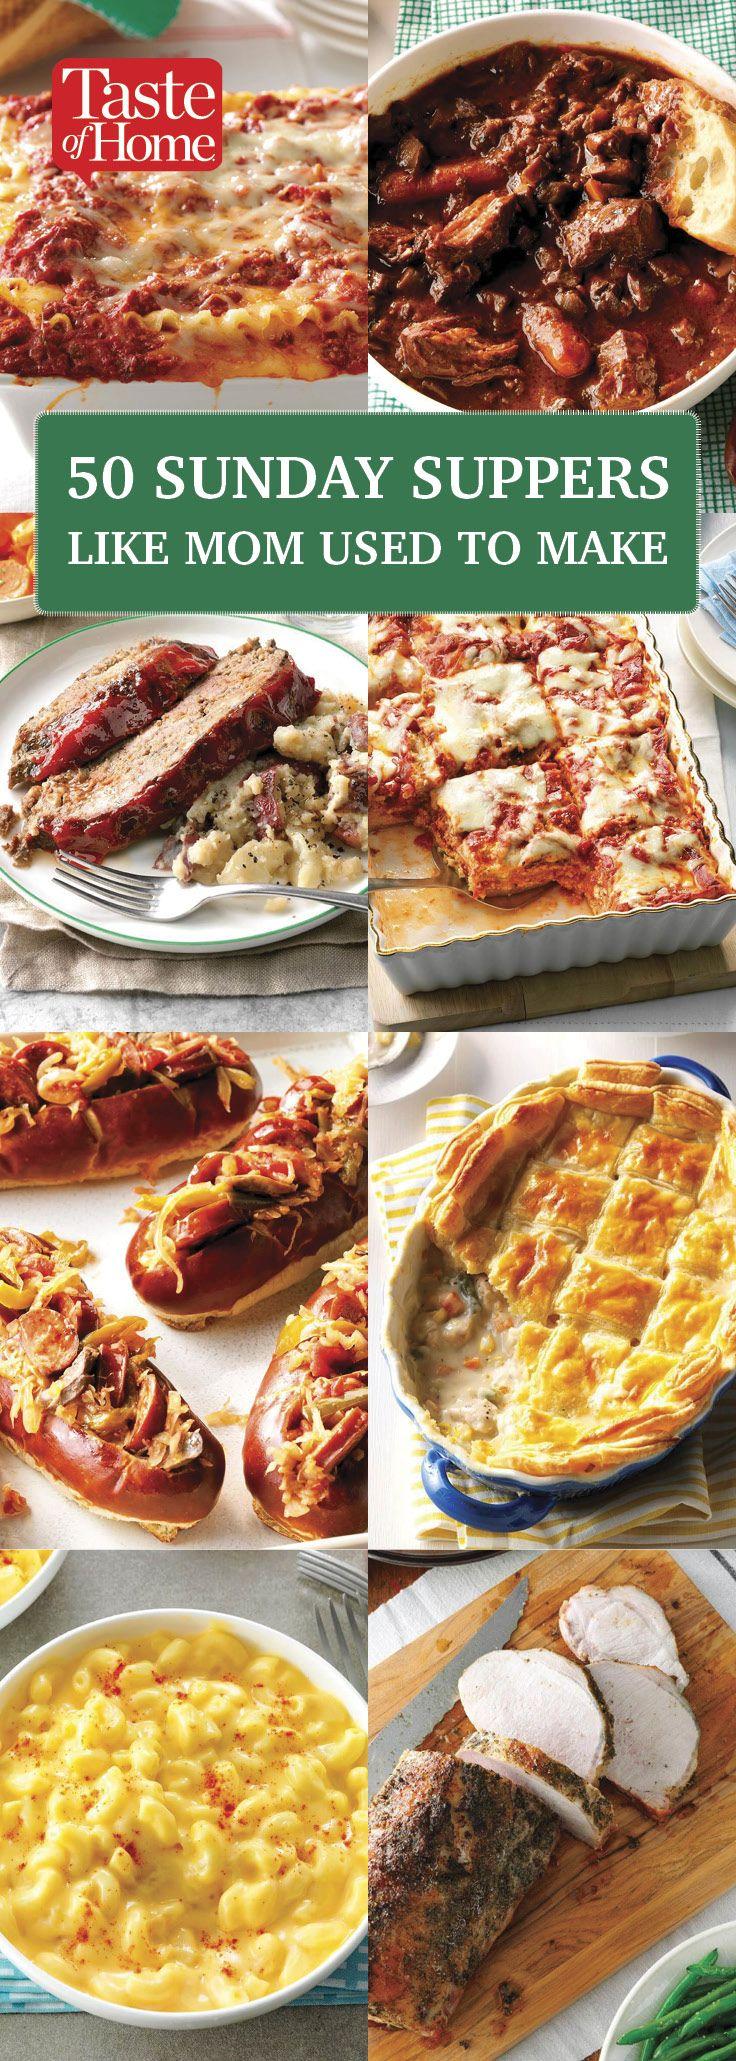 50 Sunday Suppers Like Mom Used To Make Sunday Recipes Sunday Dinner Easy Sunday Dinner